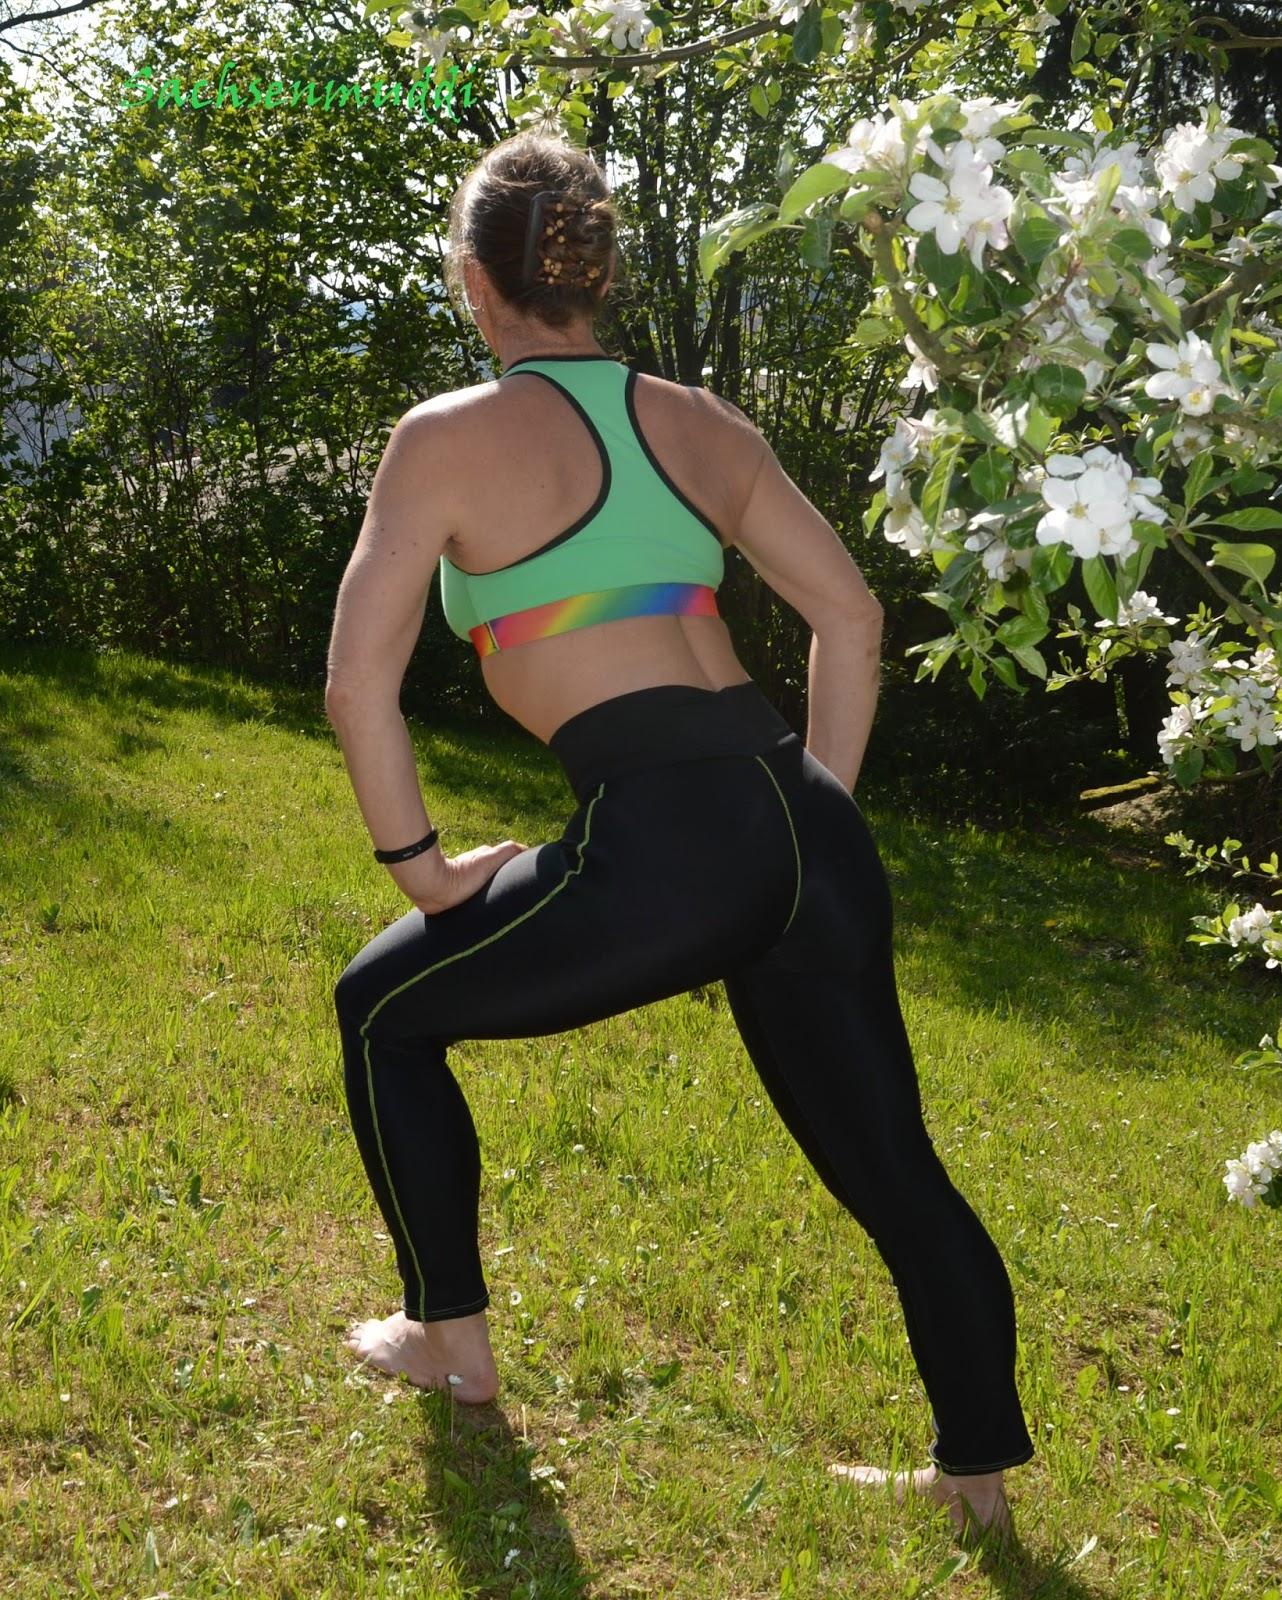 sachsenmuddis handgemachtes sporty leggings und hold n sporty. Black Bedroom Furniture Sets. Home Design Ideas